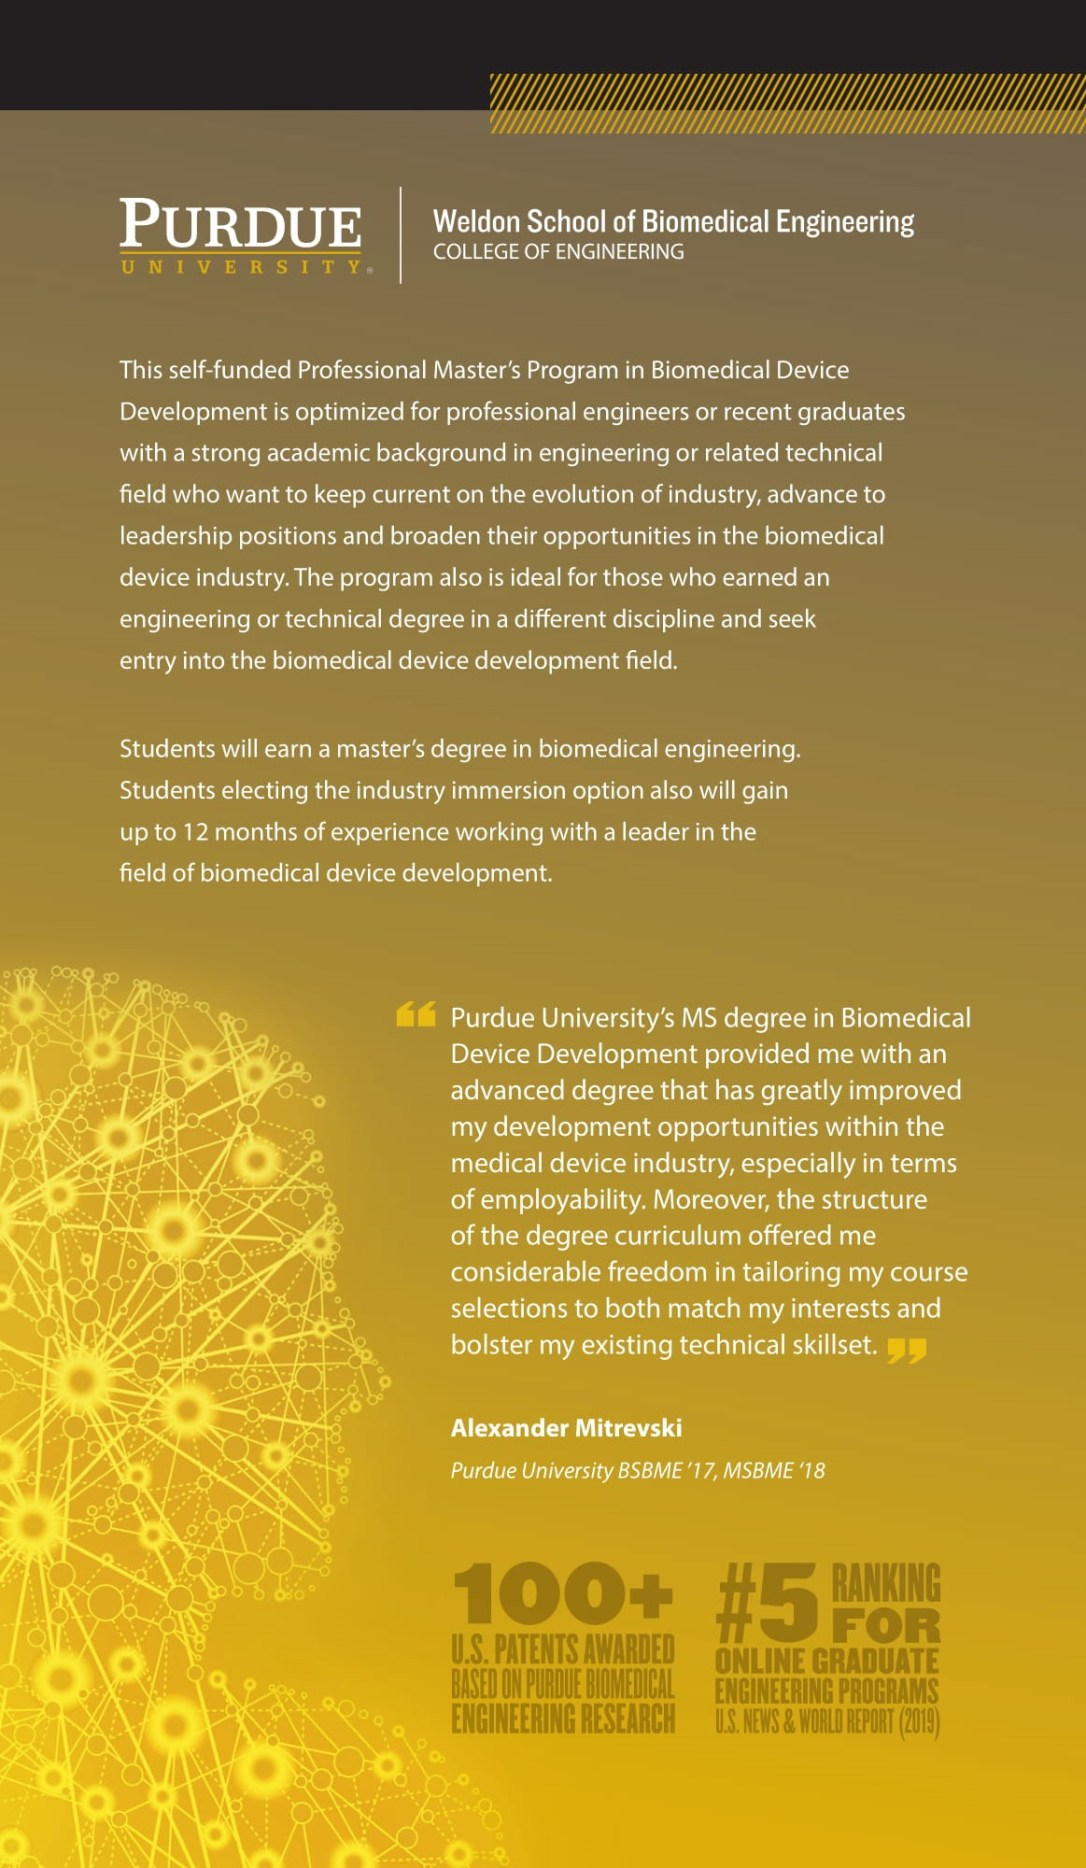 ENGS-18-11359 BME Masters Program Brochure SPLIT 02